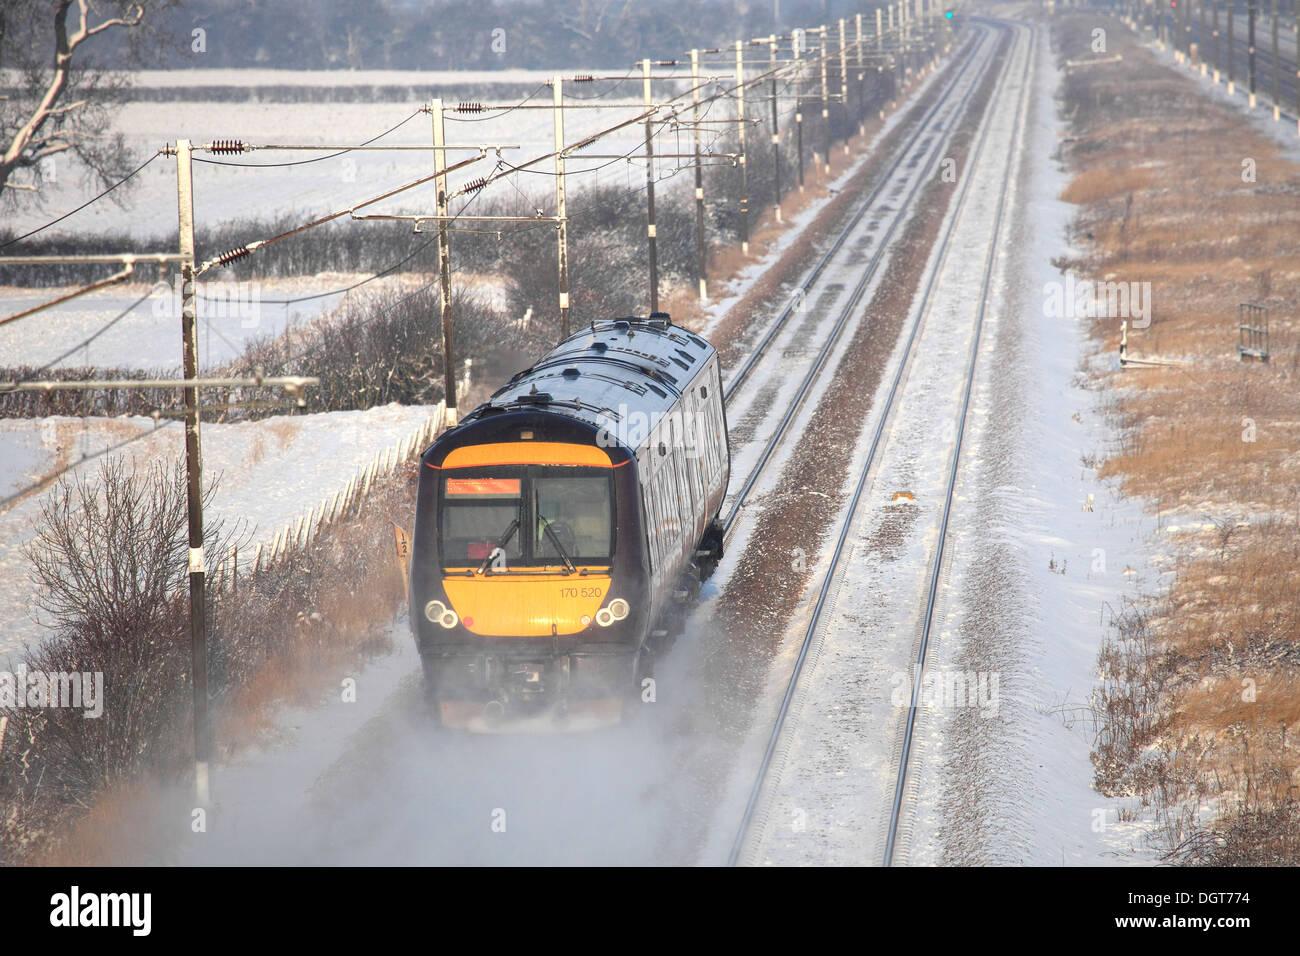 Winter Snow, 170520 County 2 County trains Turbostar Train, High Speed Diesel Train, East Coast Main Line Railway Cambridgeshire - Stock Image